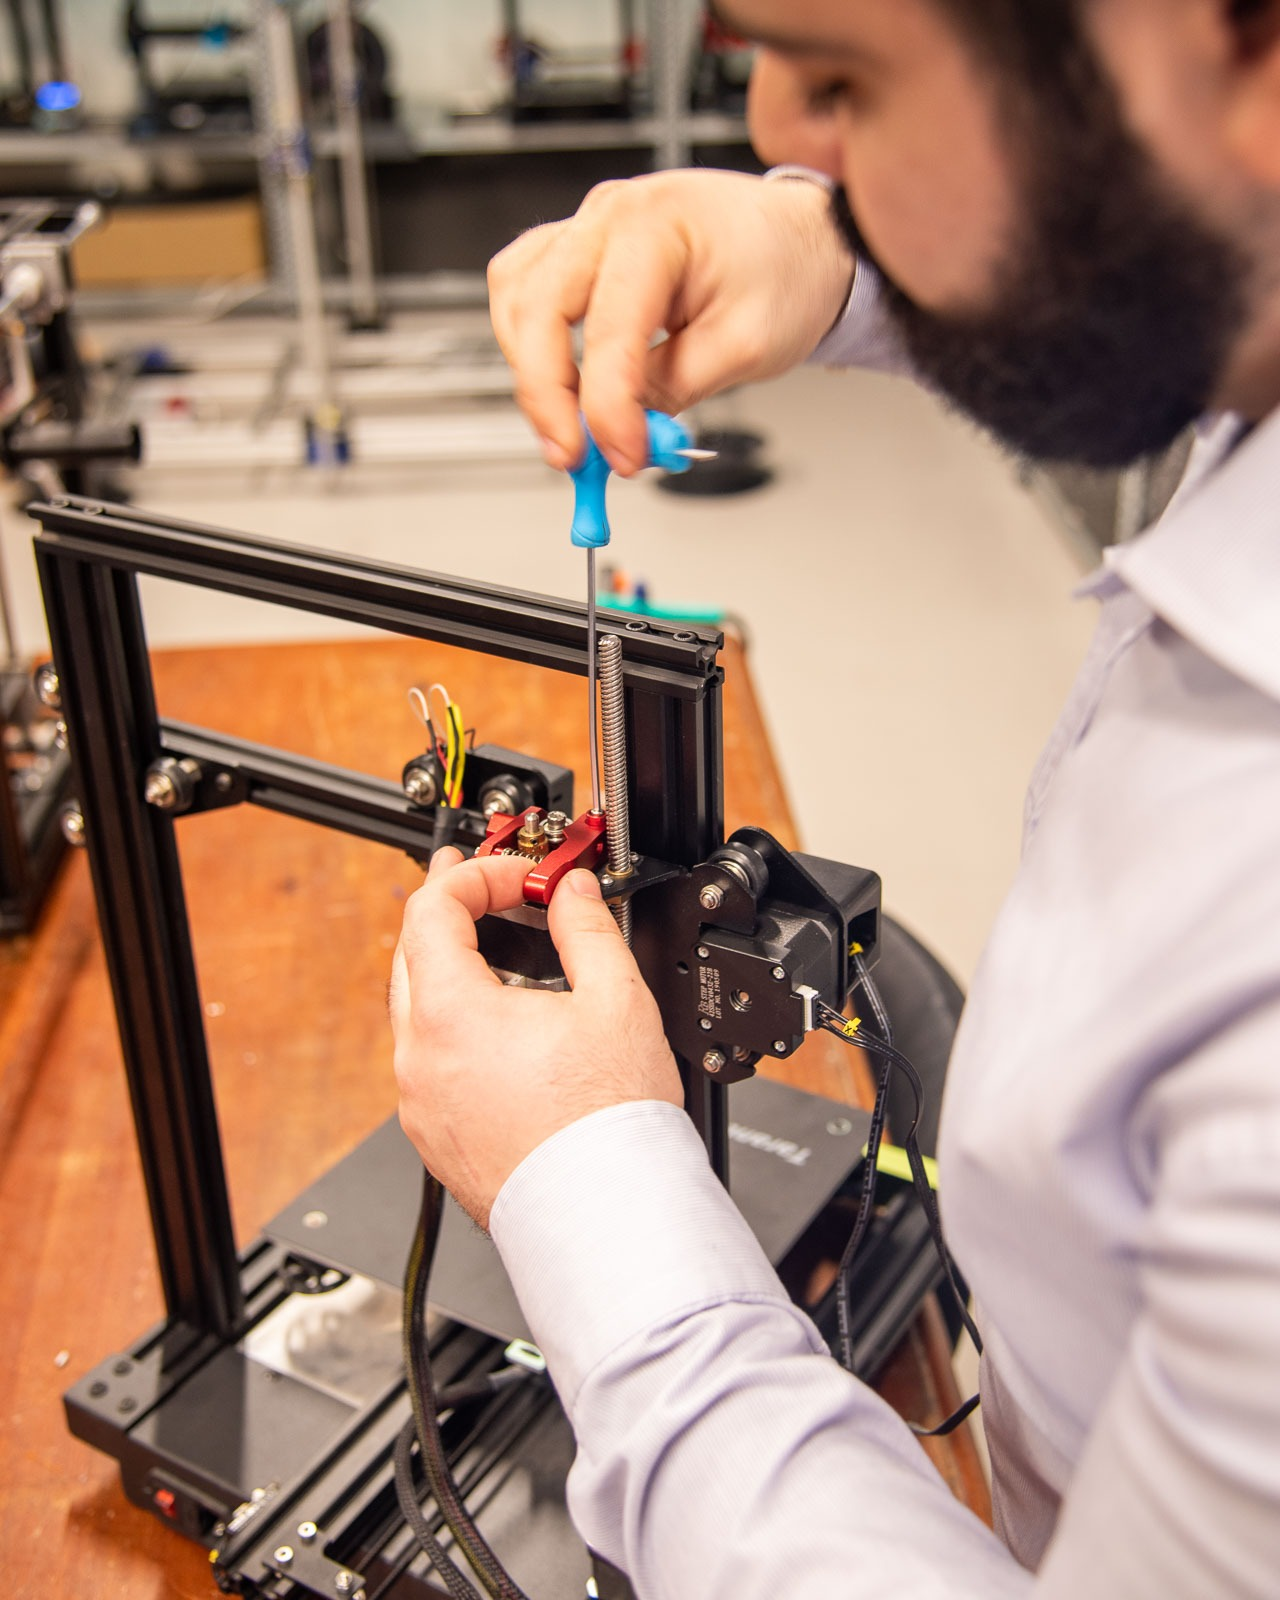 Invent 3D employee fixing 3D printer